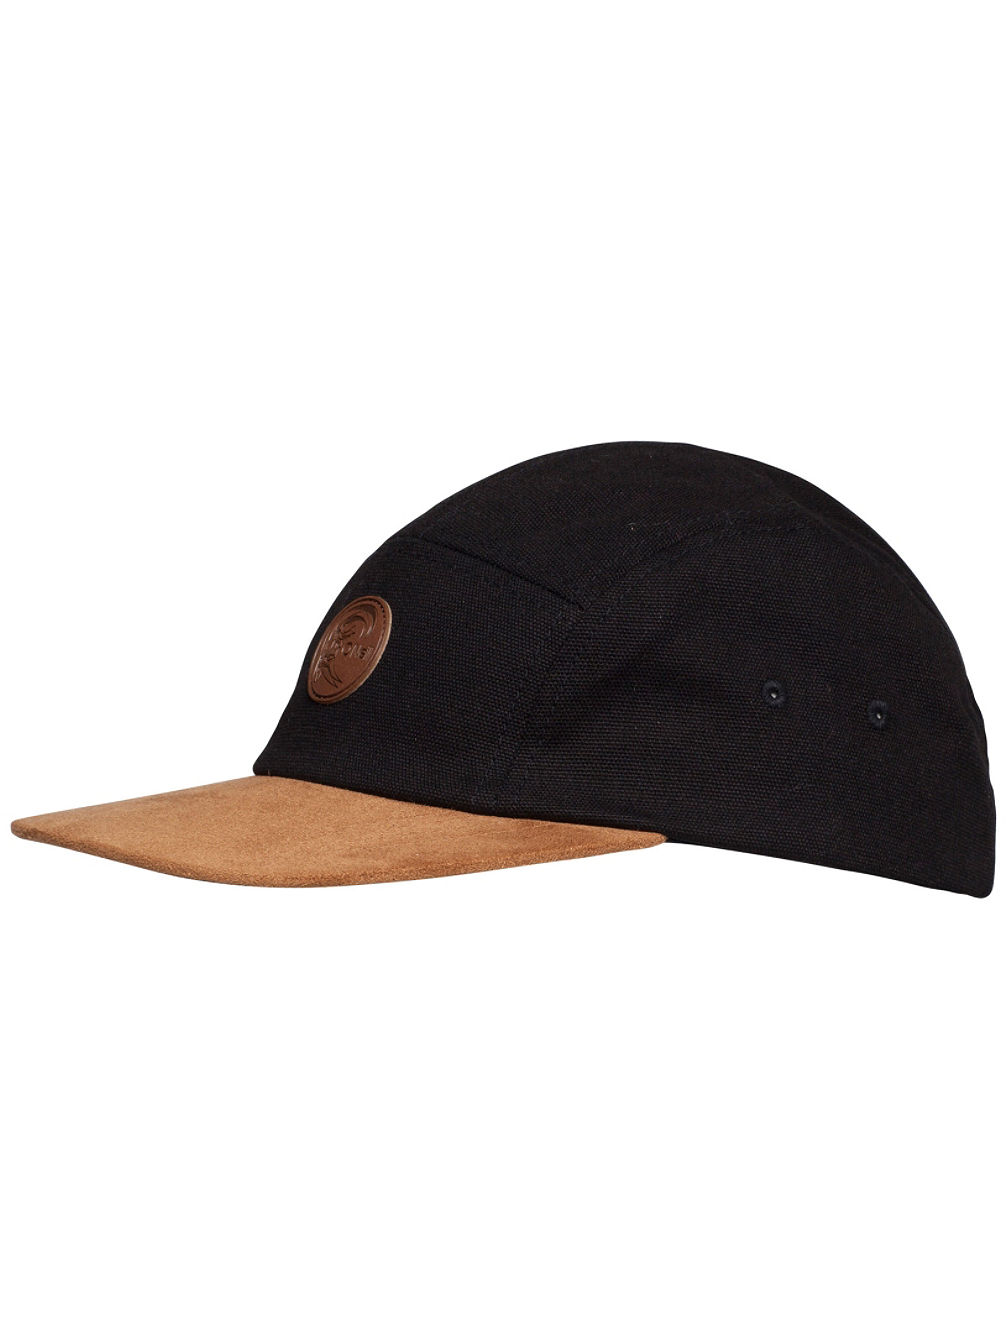 o-neill-log-cabin-cap